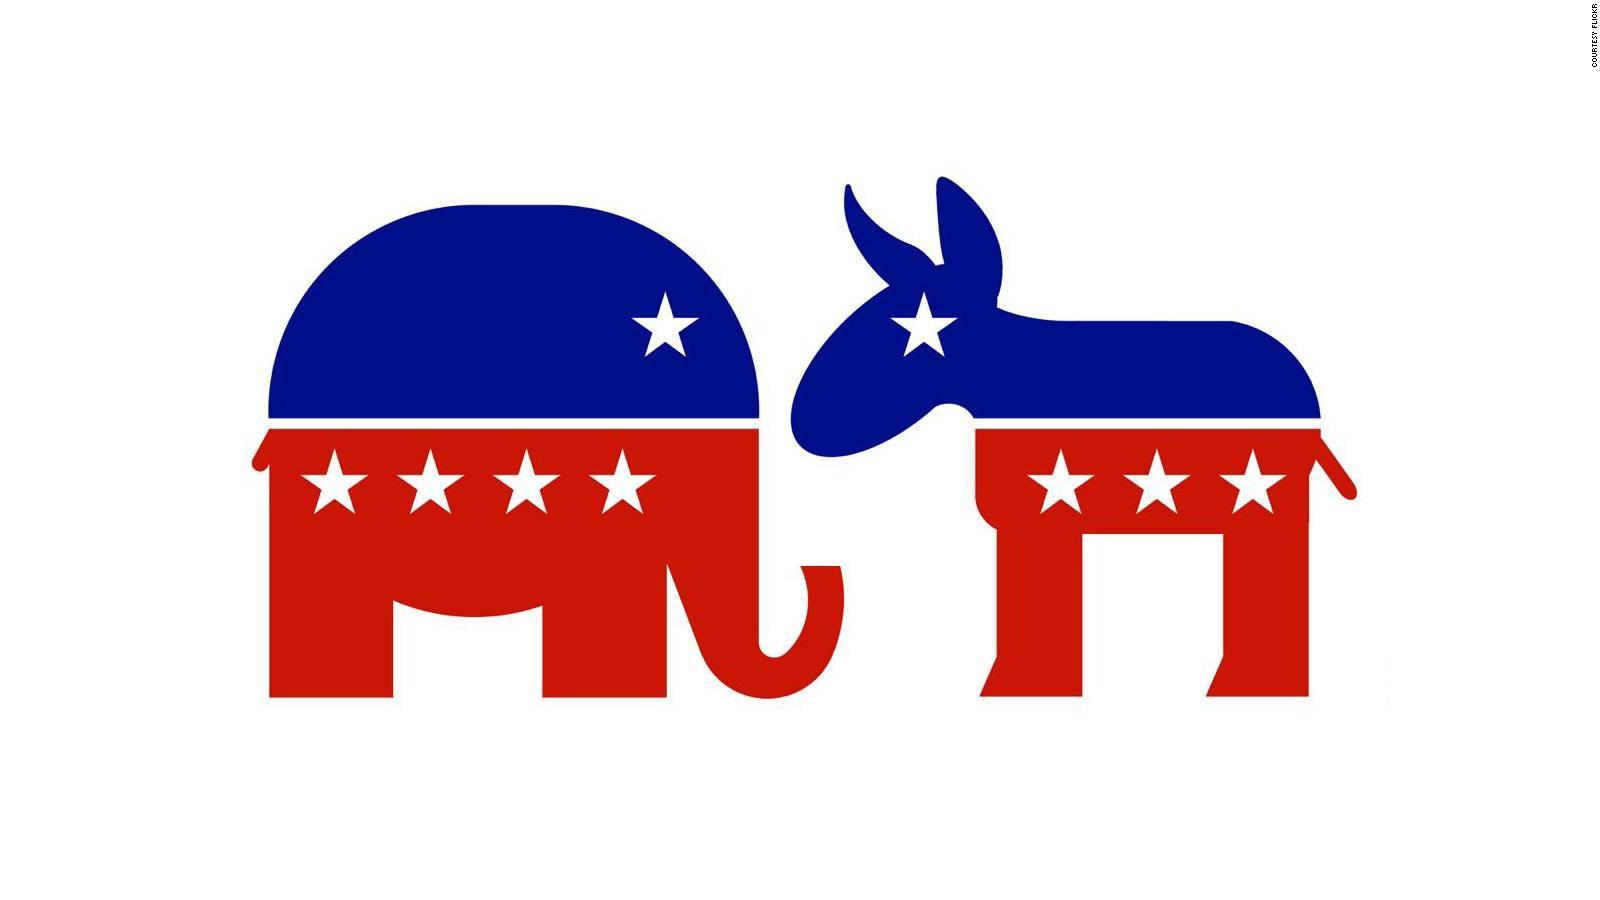 Democrats or Republicans?  Coke or Pepsi?